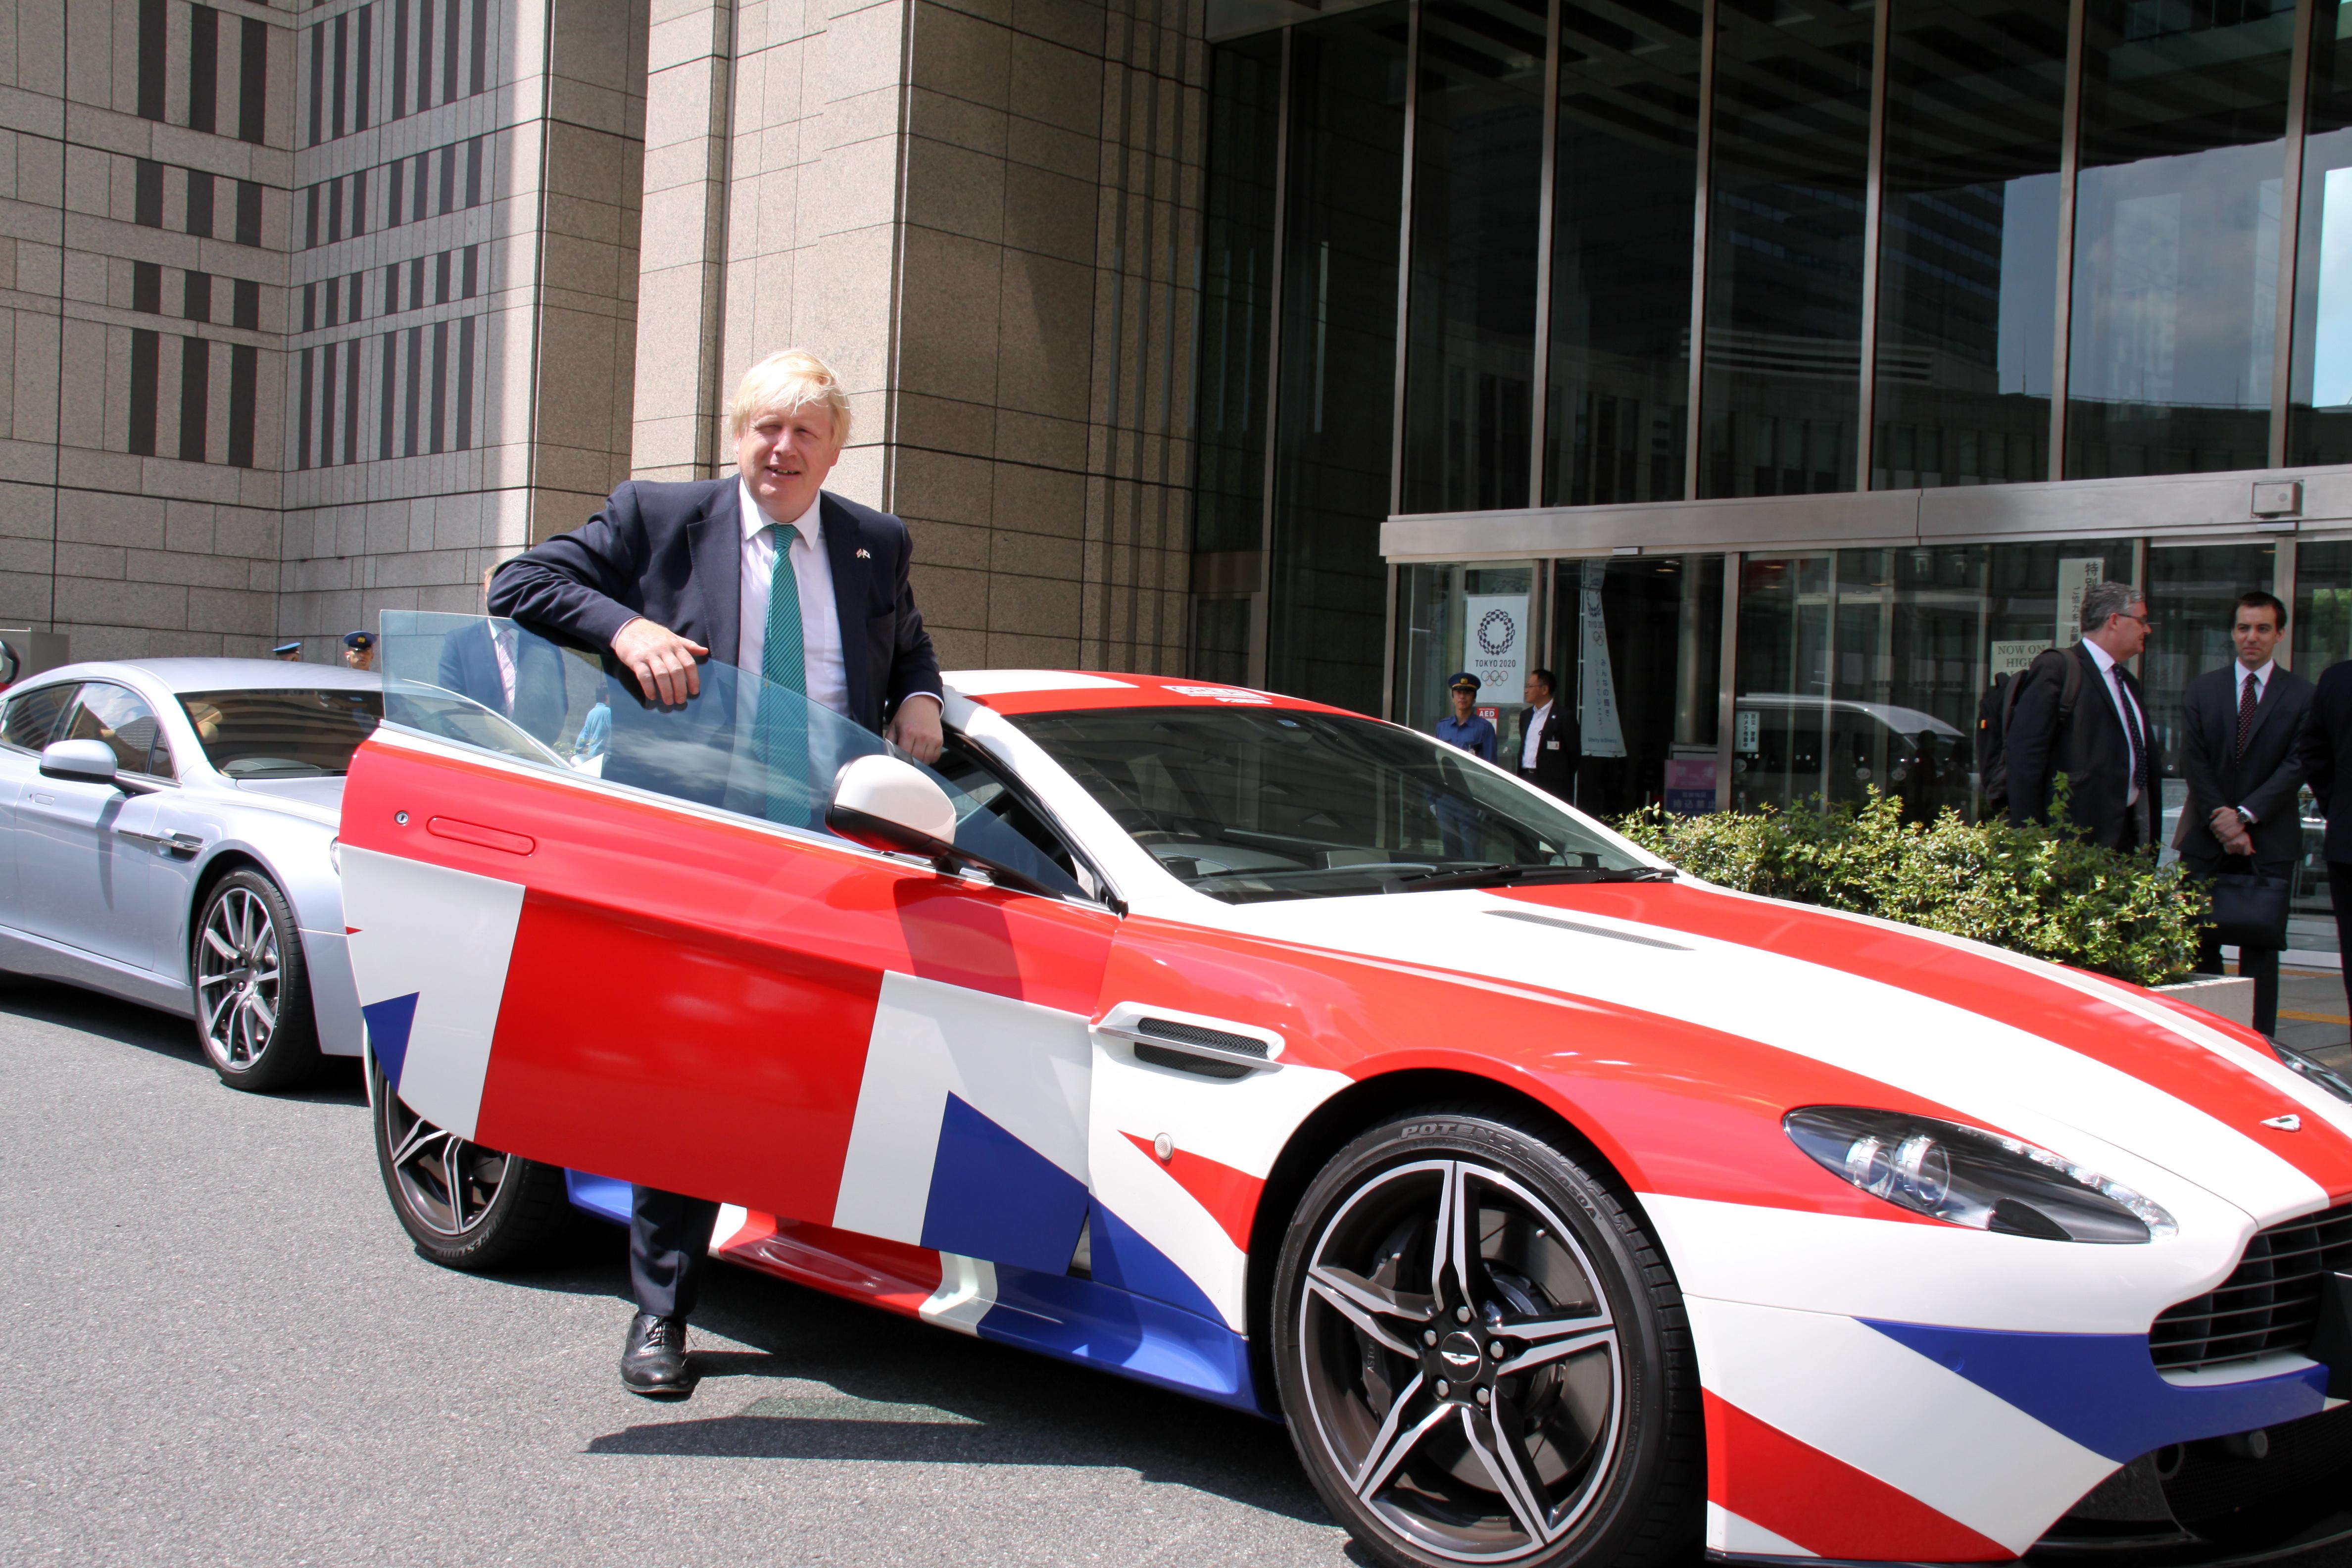 Boris Johnson inJapan.Image: Foreign Office/Wikimedia